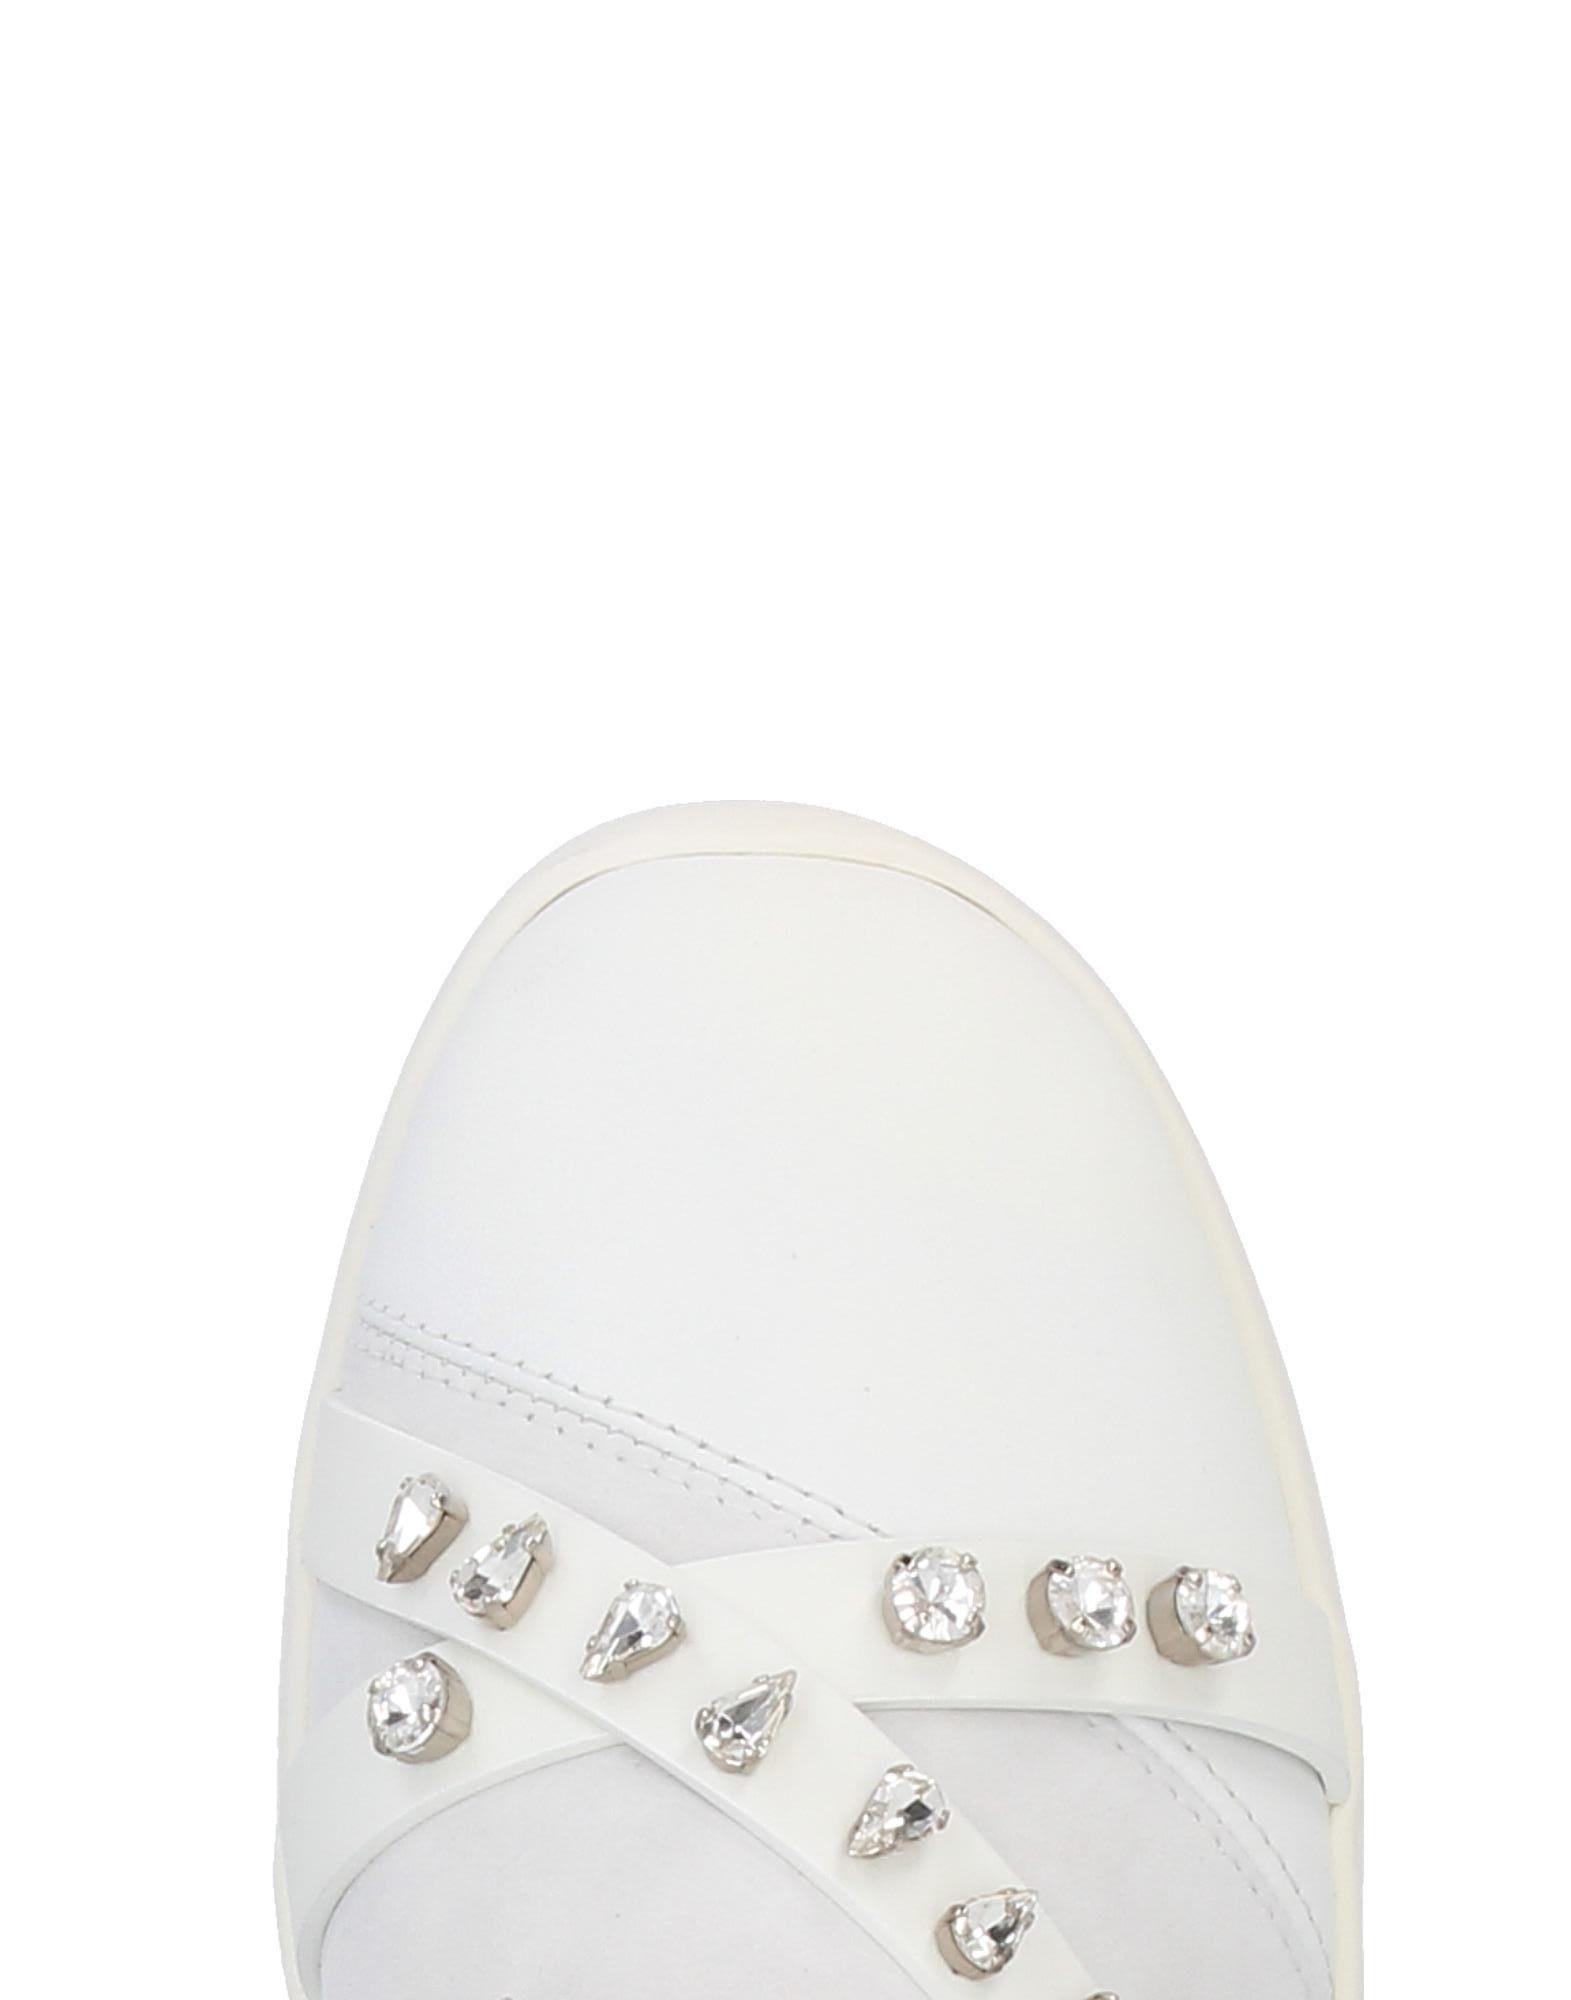 Giuseppe Zanotti Sneakers Damen  11396829VH 11396829VH  Beliebte Schuhe 1313df